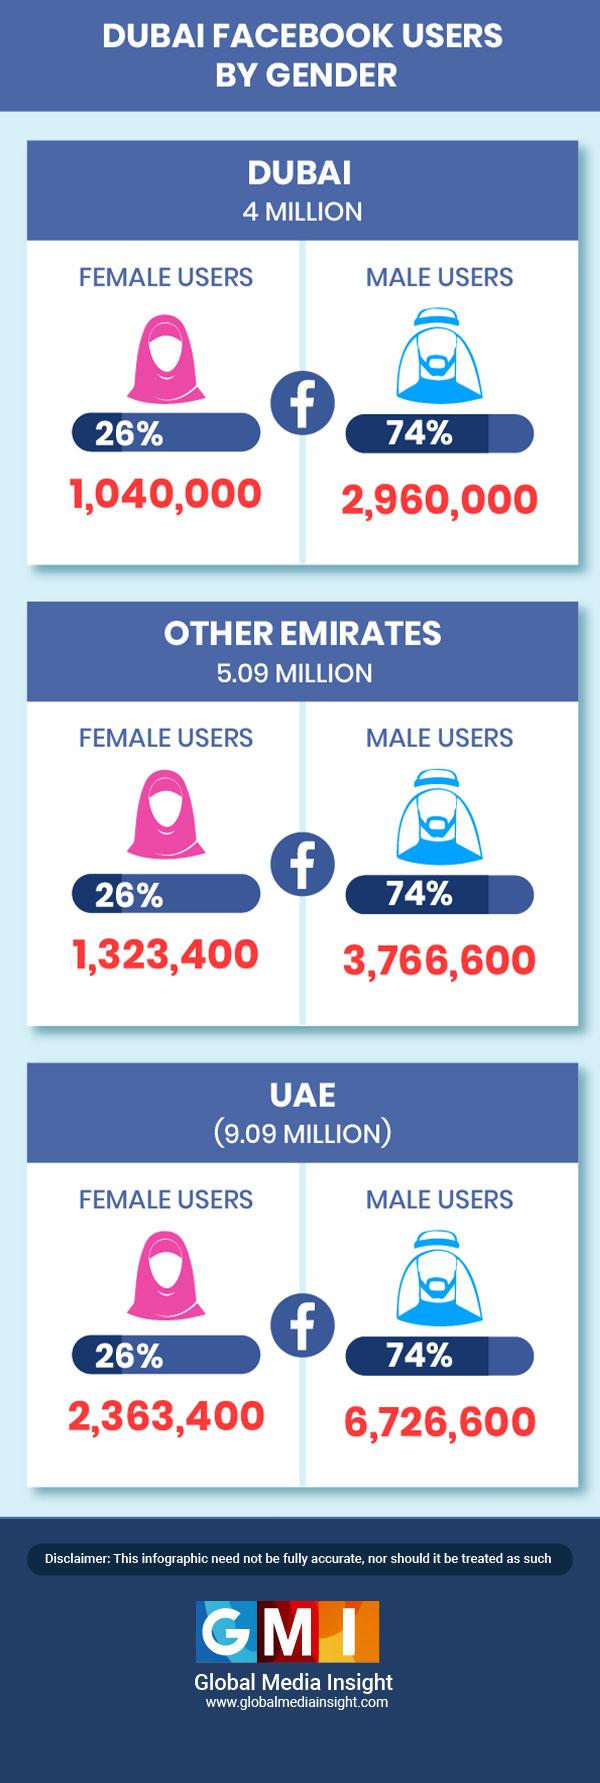 facebook statistics dubai by gender